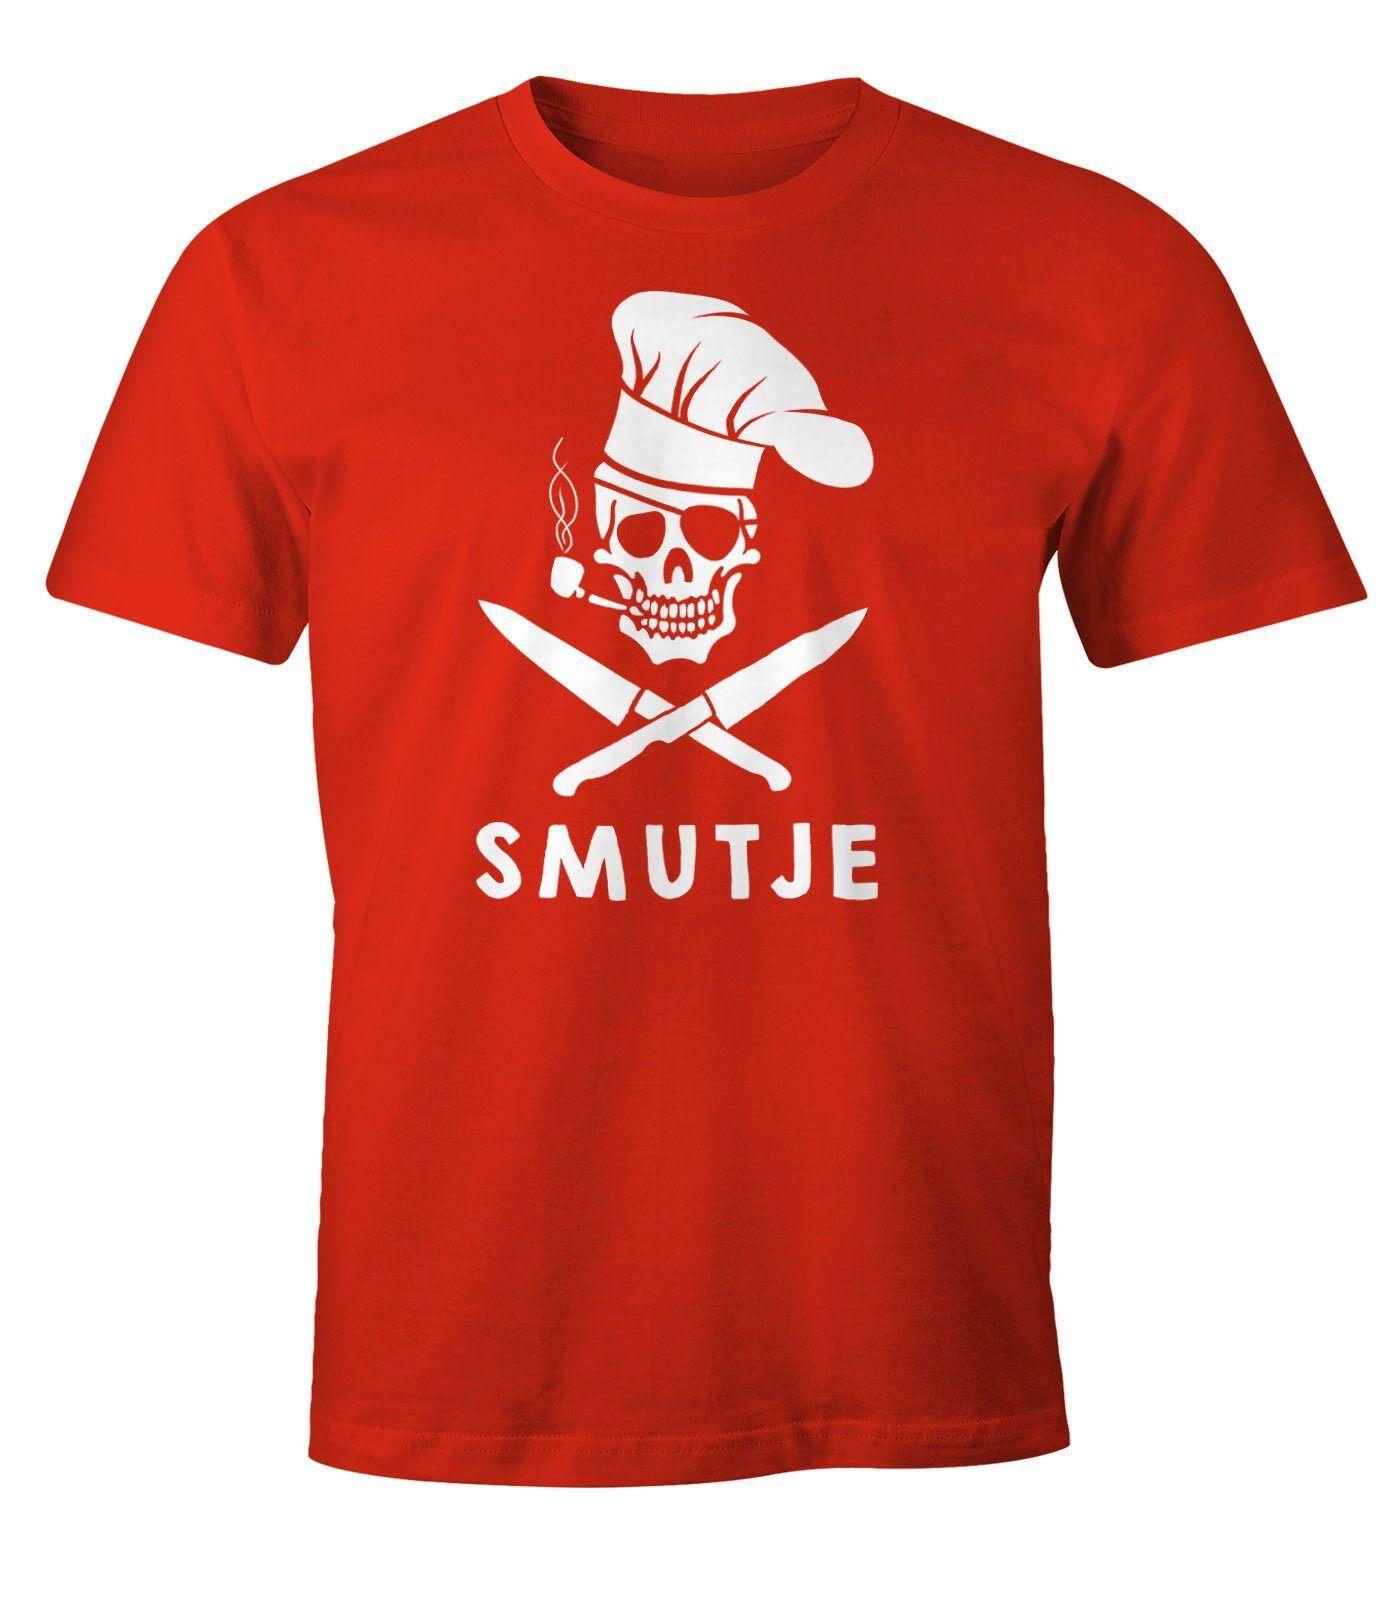 MoonWorks Print-Shirt »Herren T-Shirt Koch Smutje Pirat Fun-Shirt ®« mit Print, rot